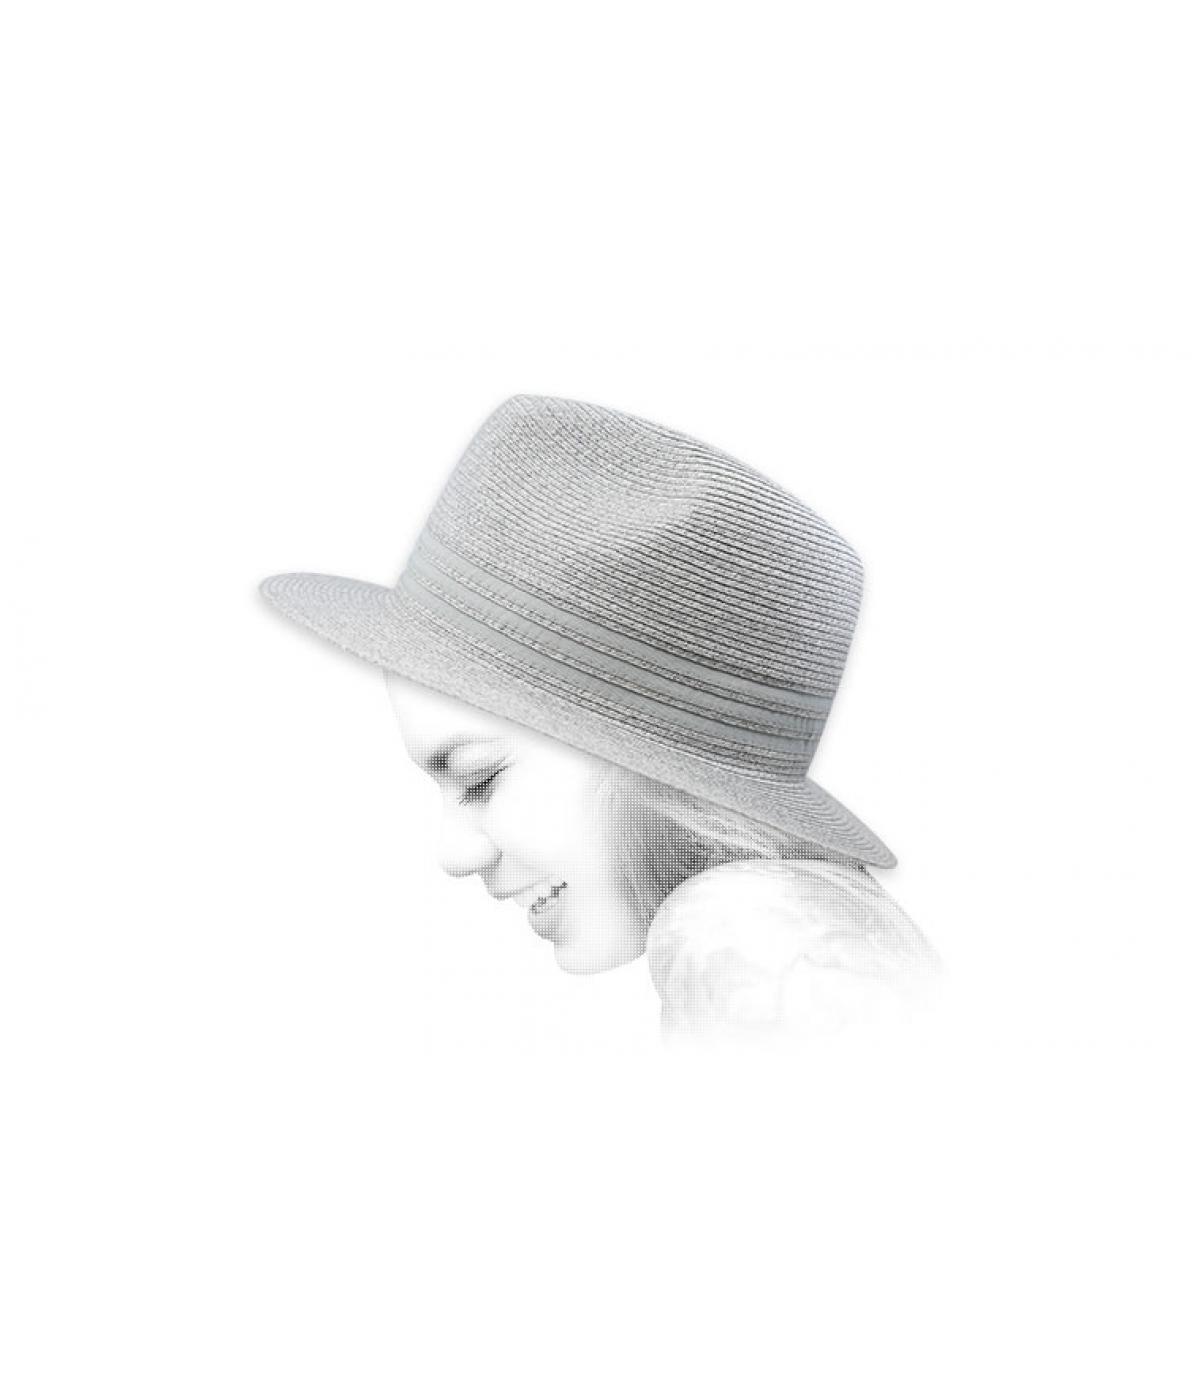 Fedora Strohhut grau